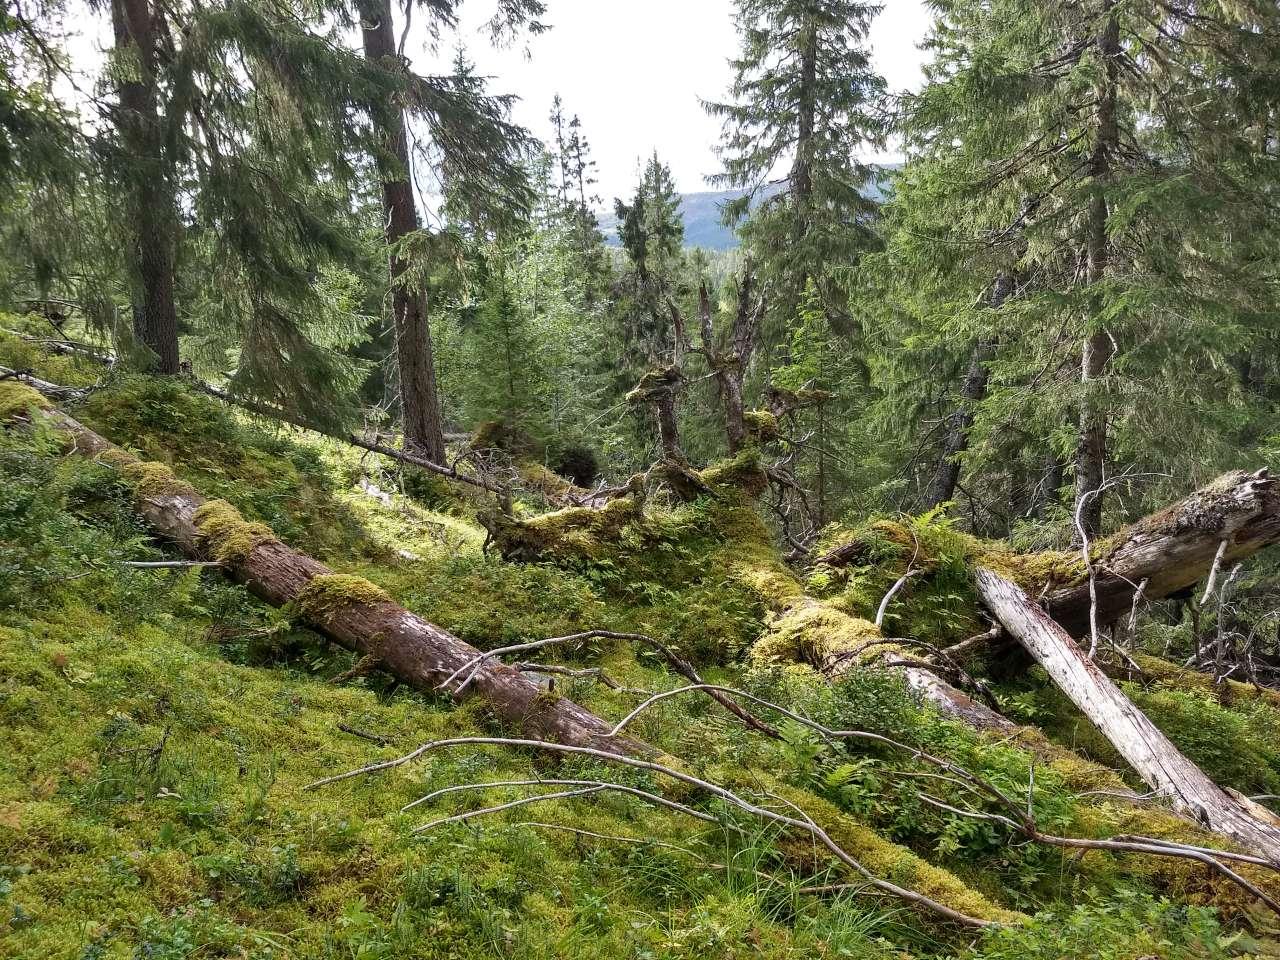 Gammel skog øker - Foto Aksel Granhus - NIBIO